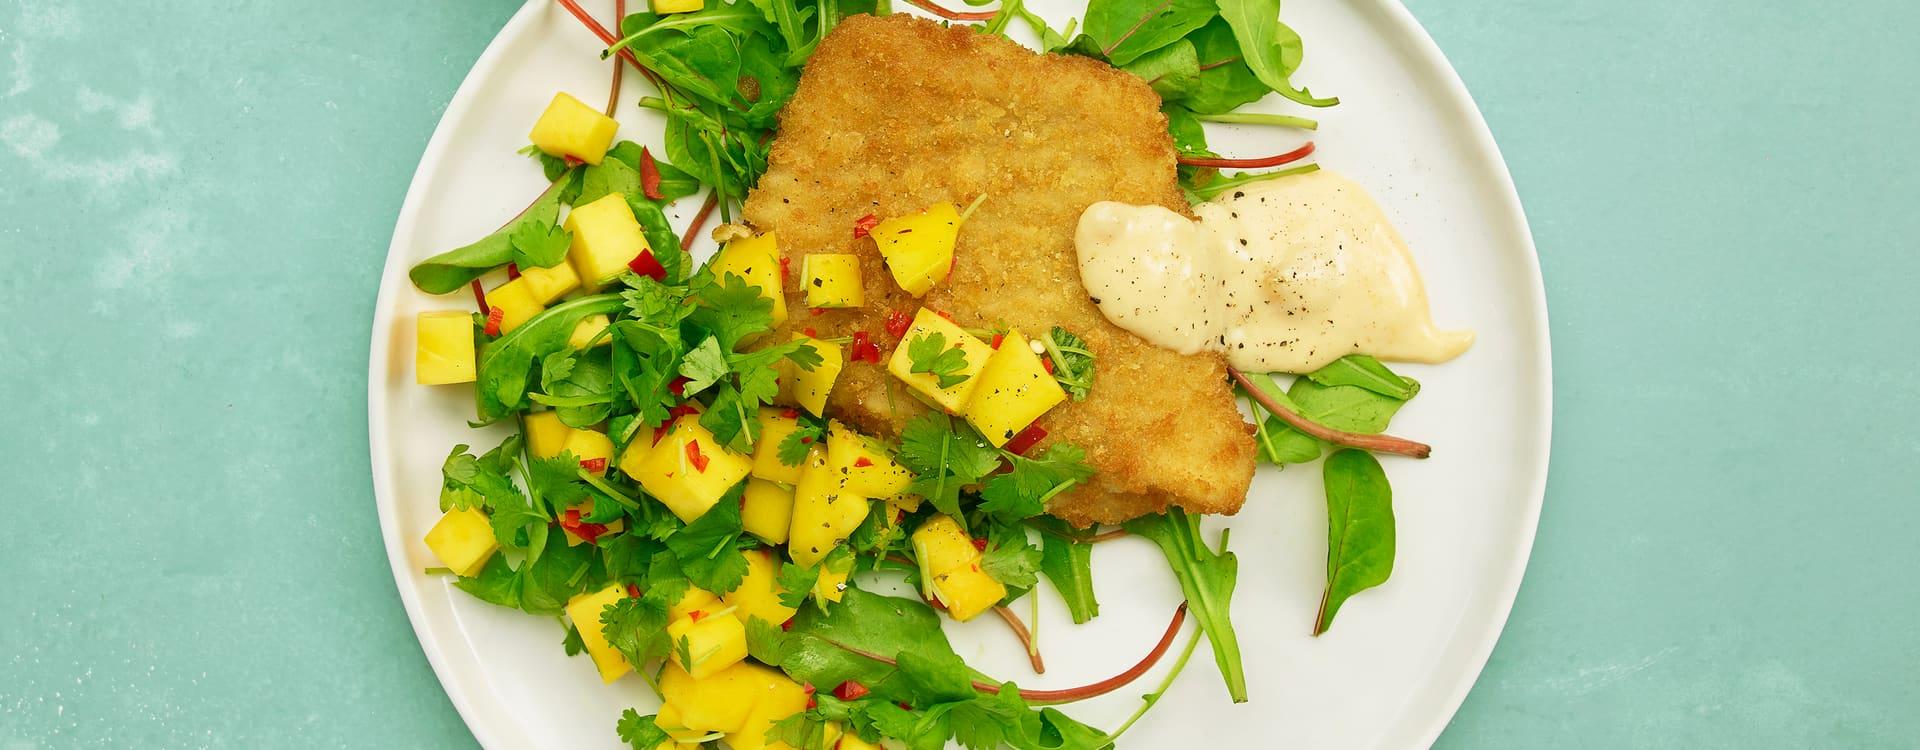 Pankopanert torsk med mangosalat